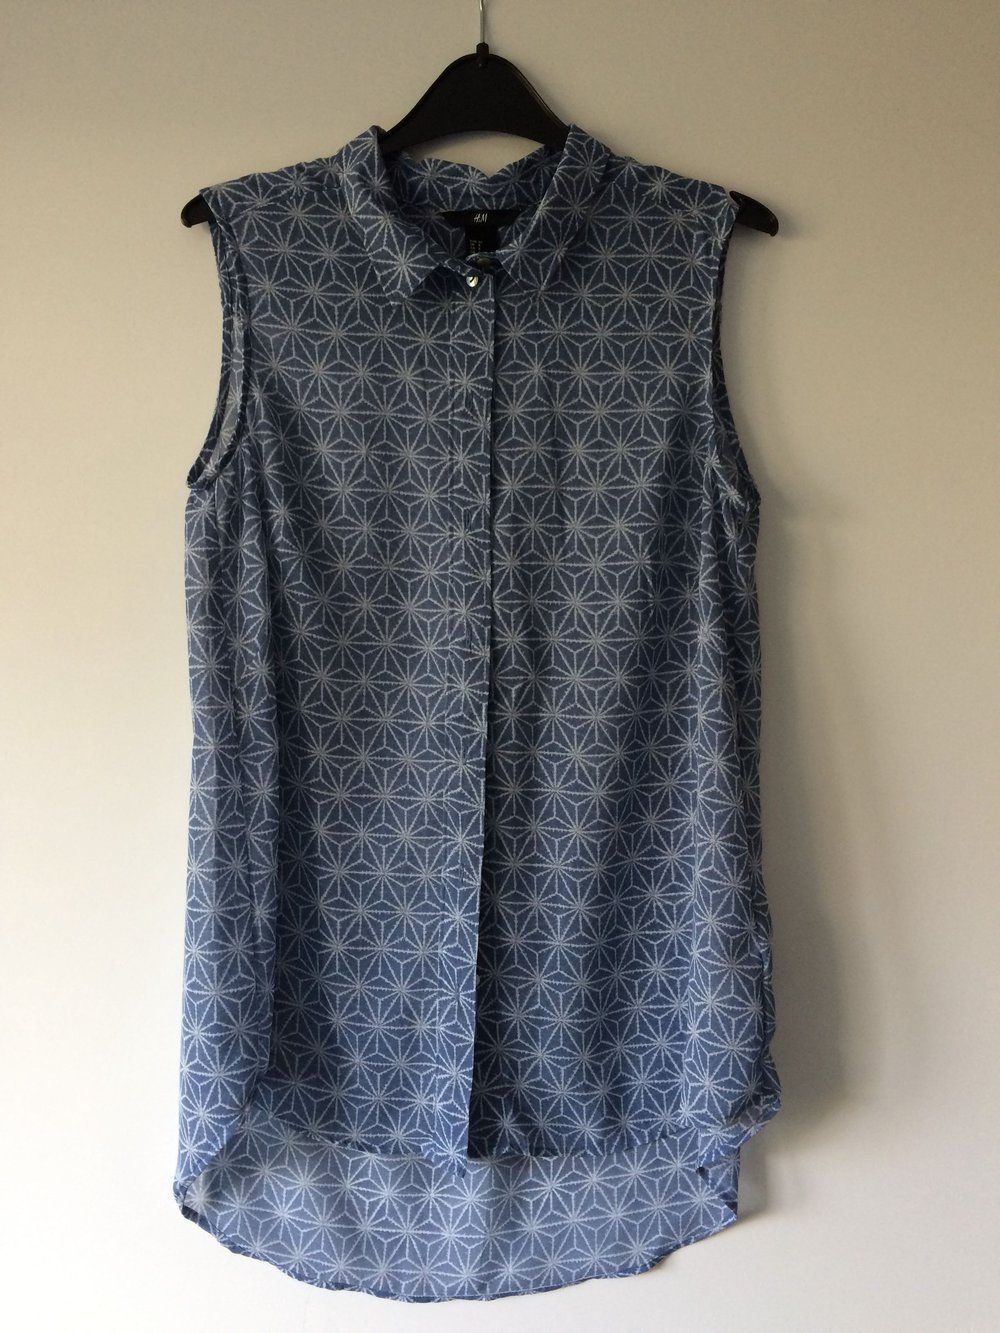 58b28fb330acc2 Ärmellose H&M Bluse, Größe 38 :: Kleiderkorb.de